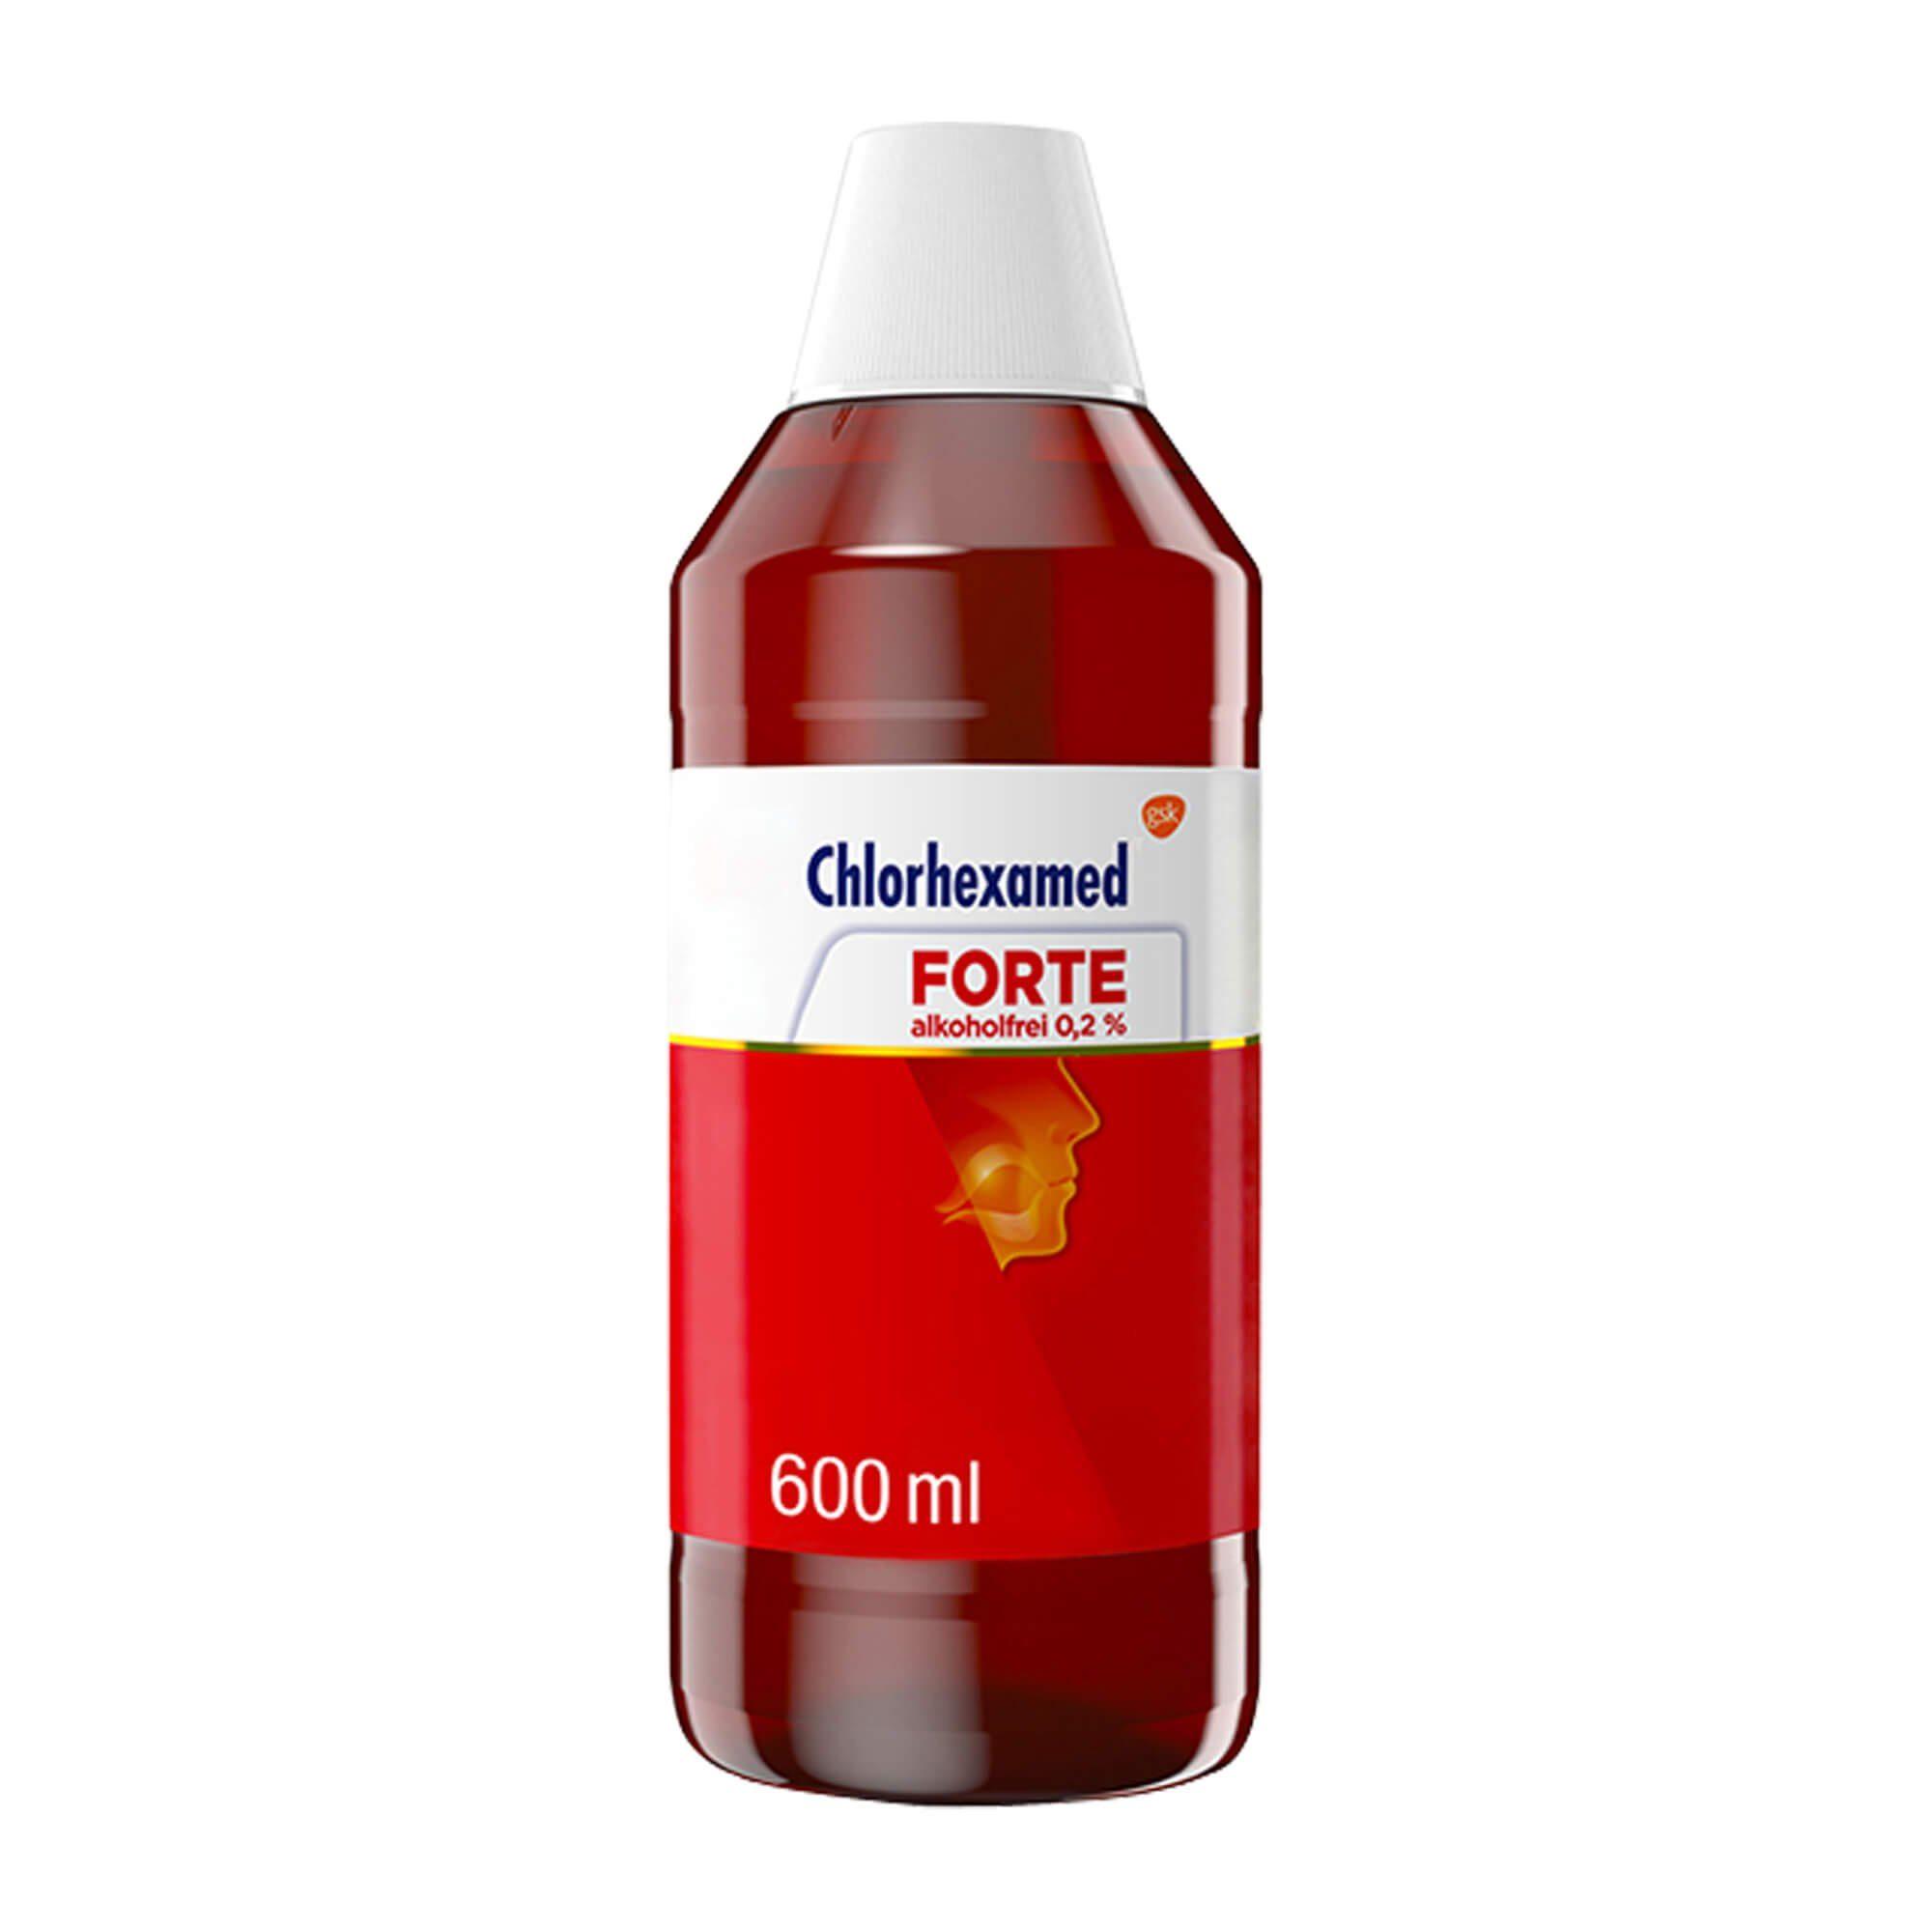 Chlorhexamed FORTE alkoholfrei 0,2% Lösung, 600 ml